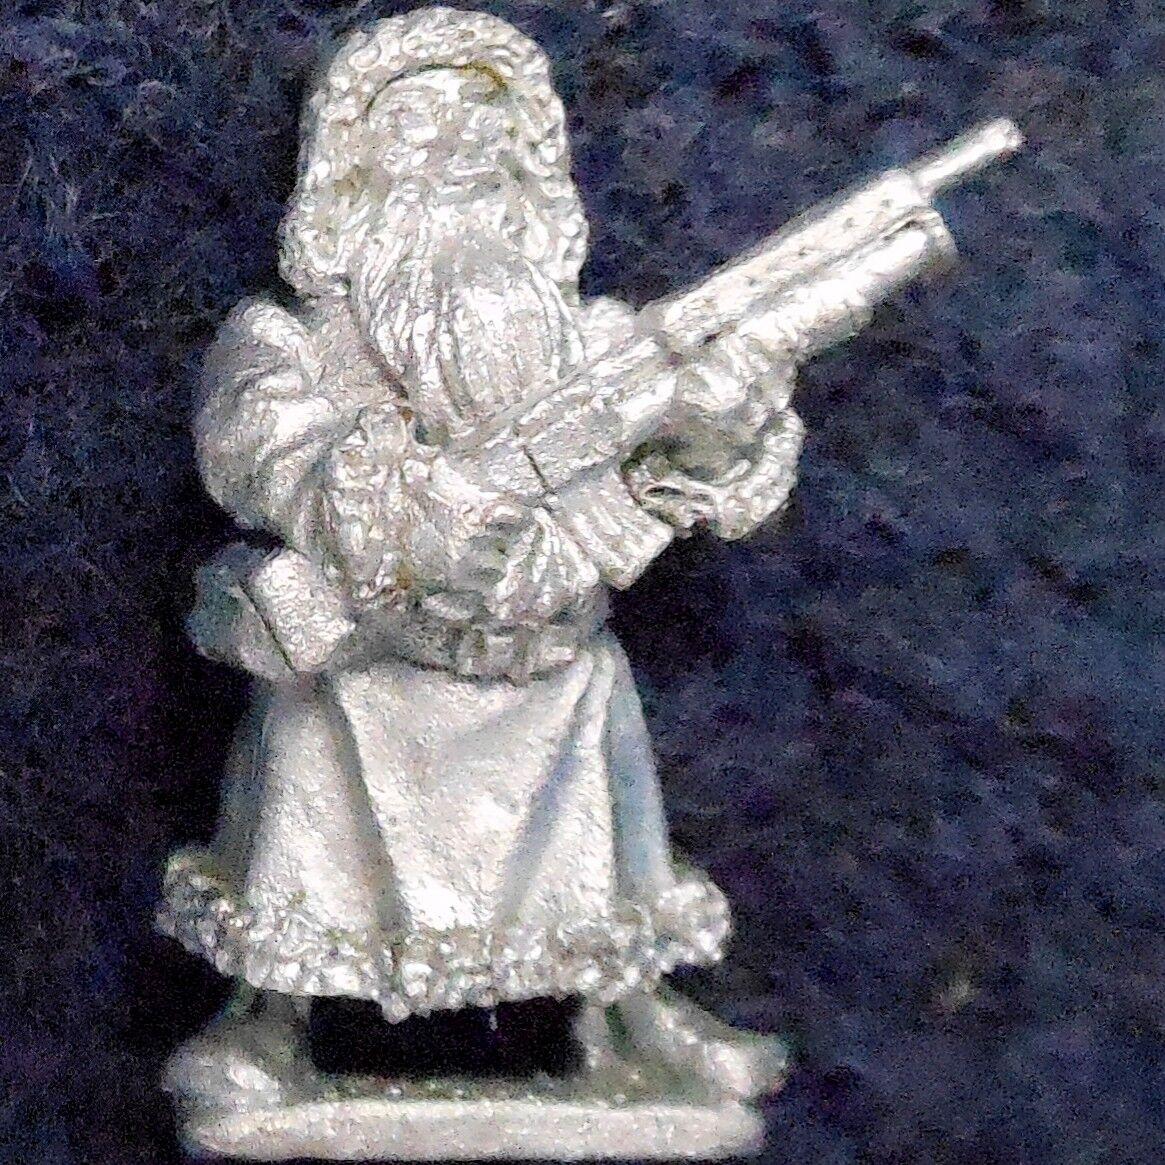 1988 Limited Edition Dark Future Santa Claus Dwarf Citadel Father Christmas GW